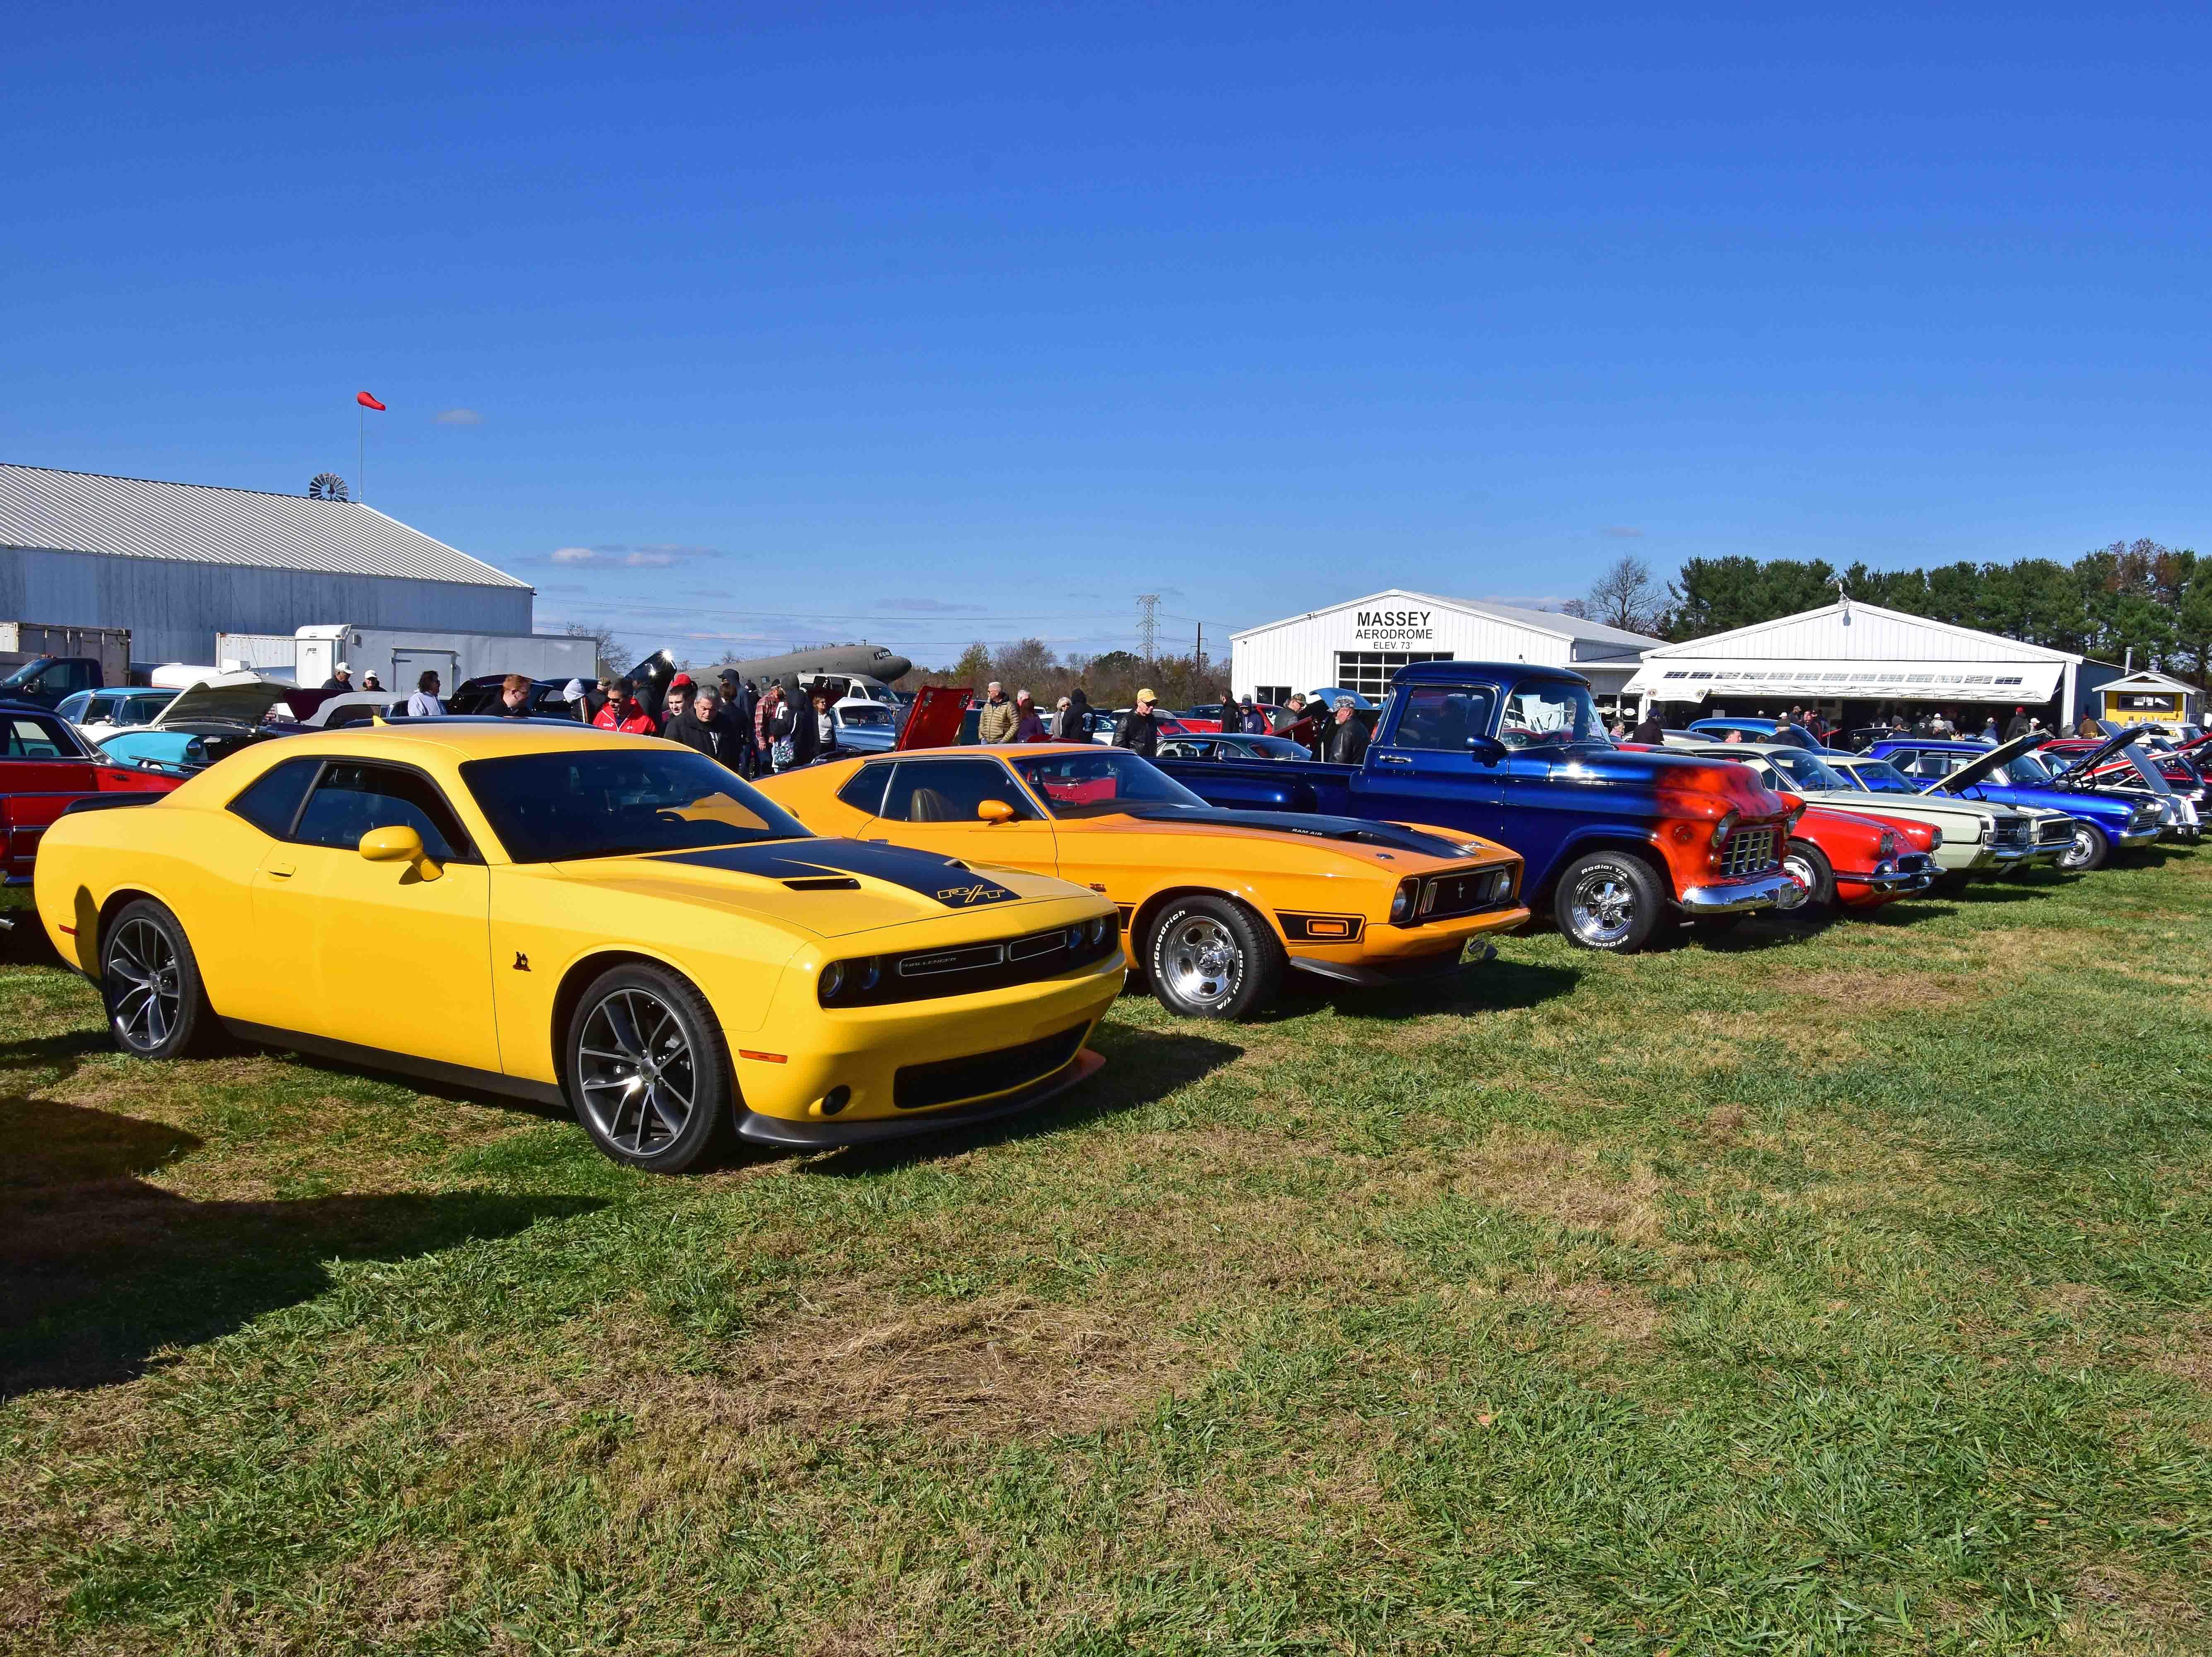 Galena Lions Club Car Show at Massey Aerodrome